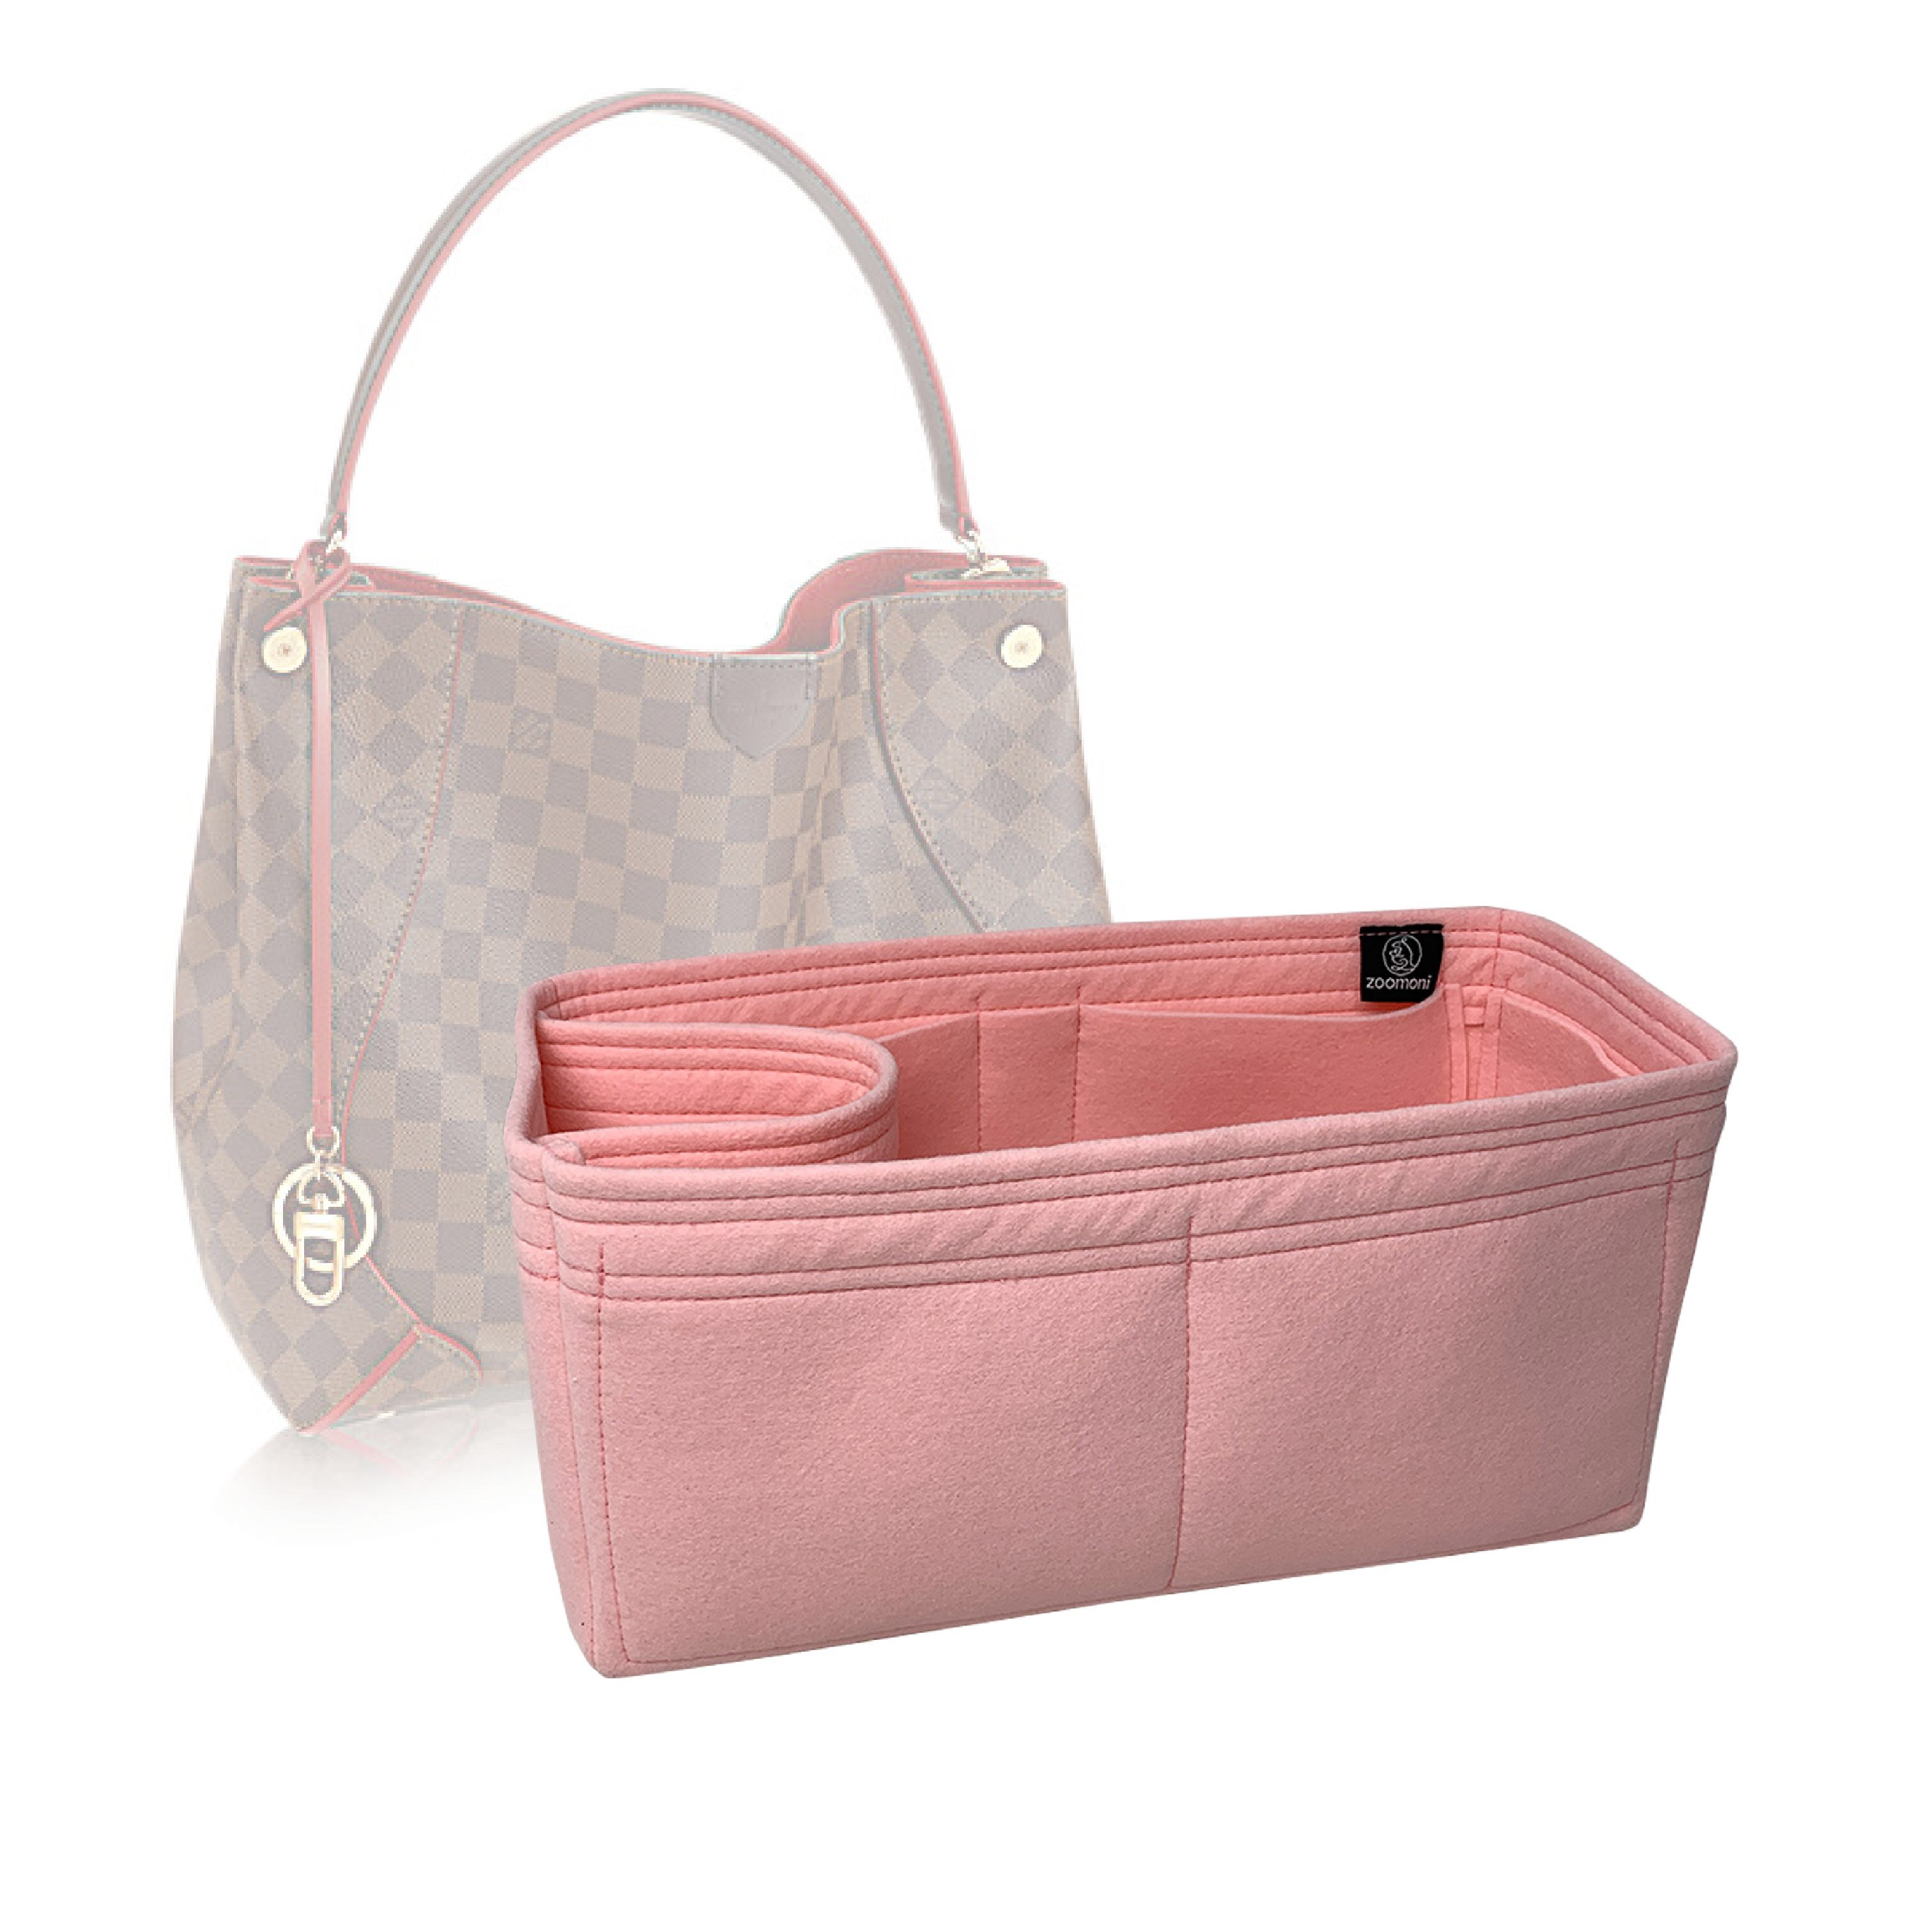 d58cc0efa5 Louis Vuitton Caissa Hobo Bag Organizer – Zoomoni